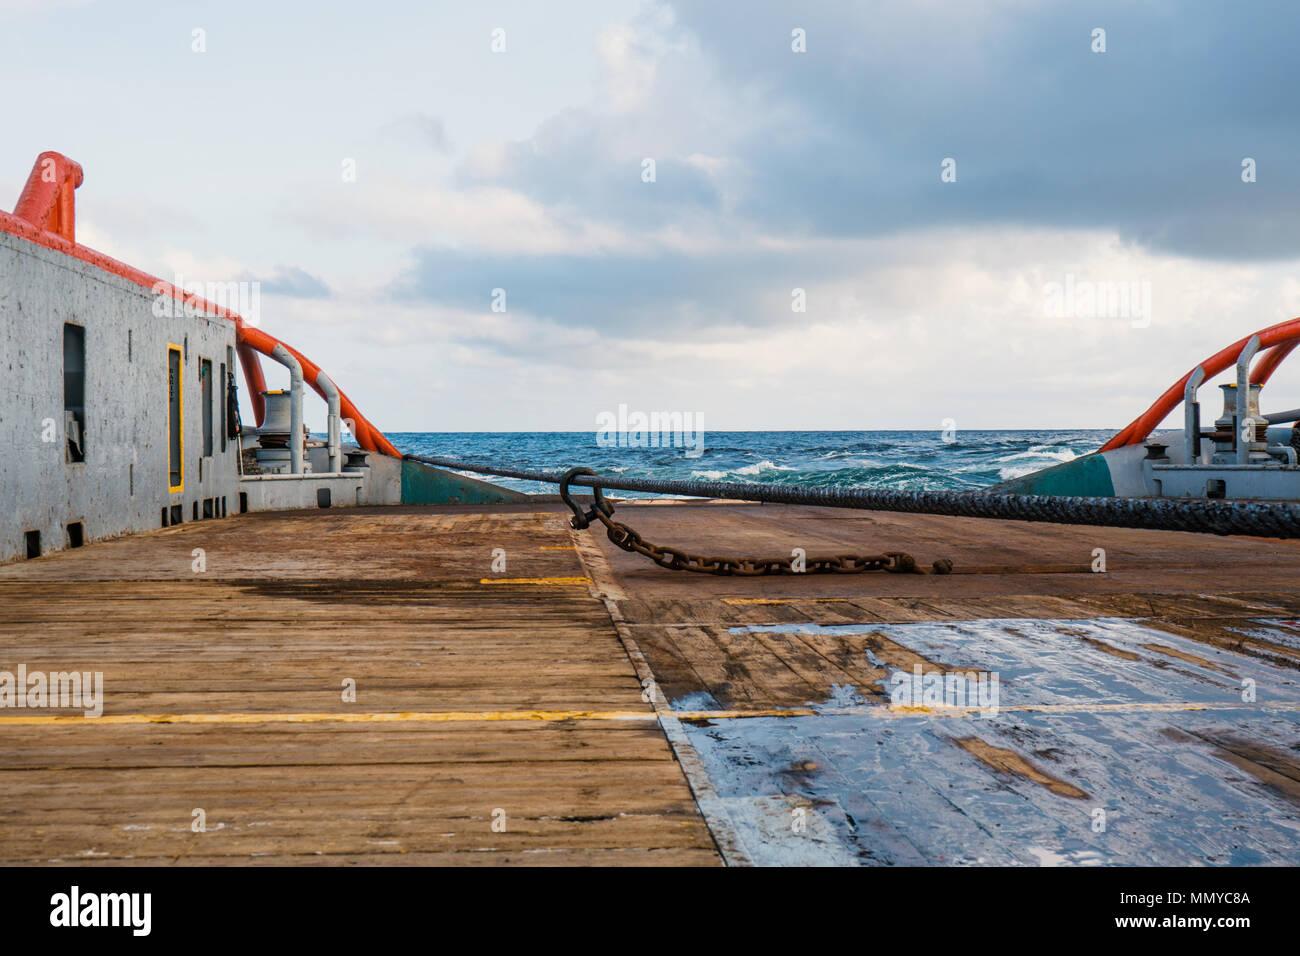 Anchor-handling Tug Supply AHTS vessel doing static tow tanker lifting. Ocean tug job. Stock Photo